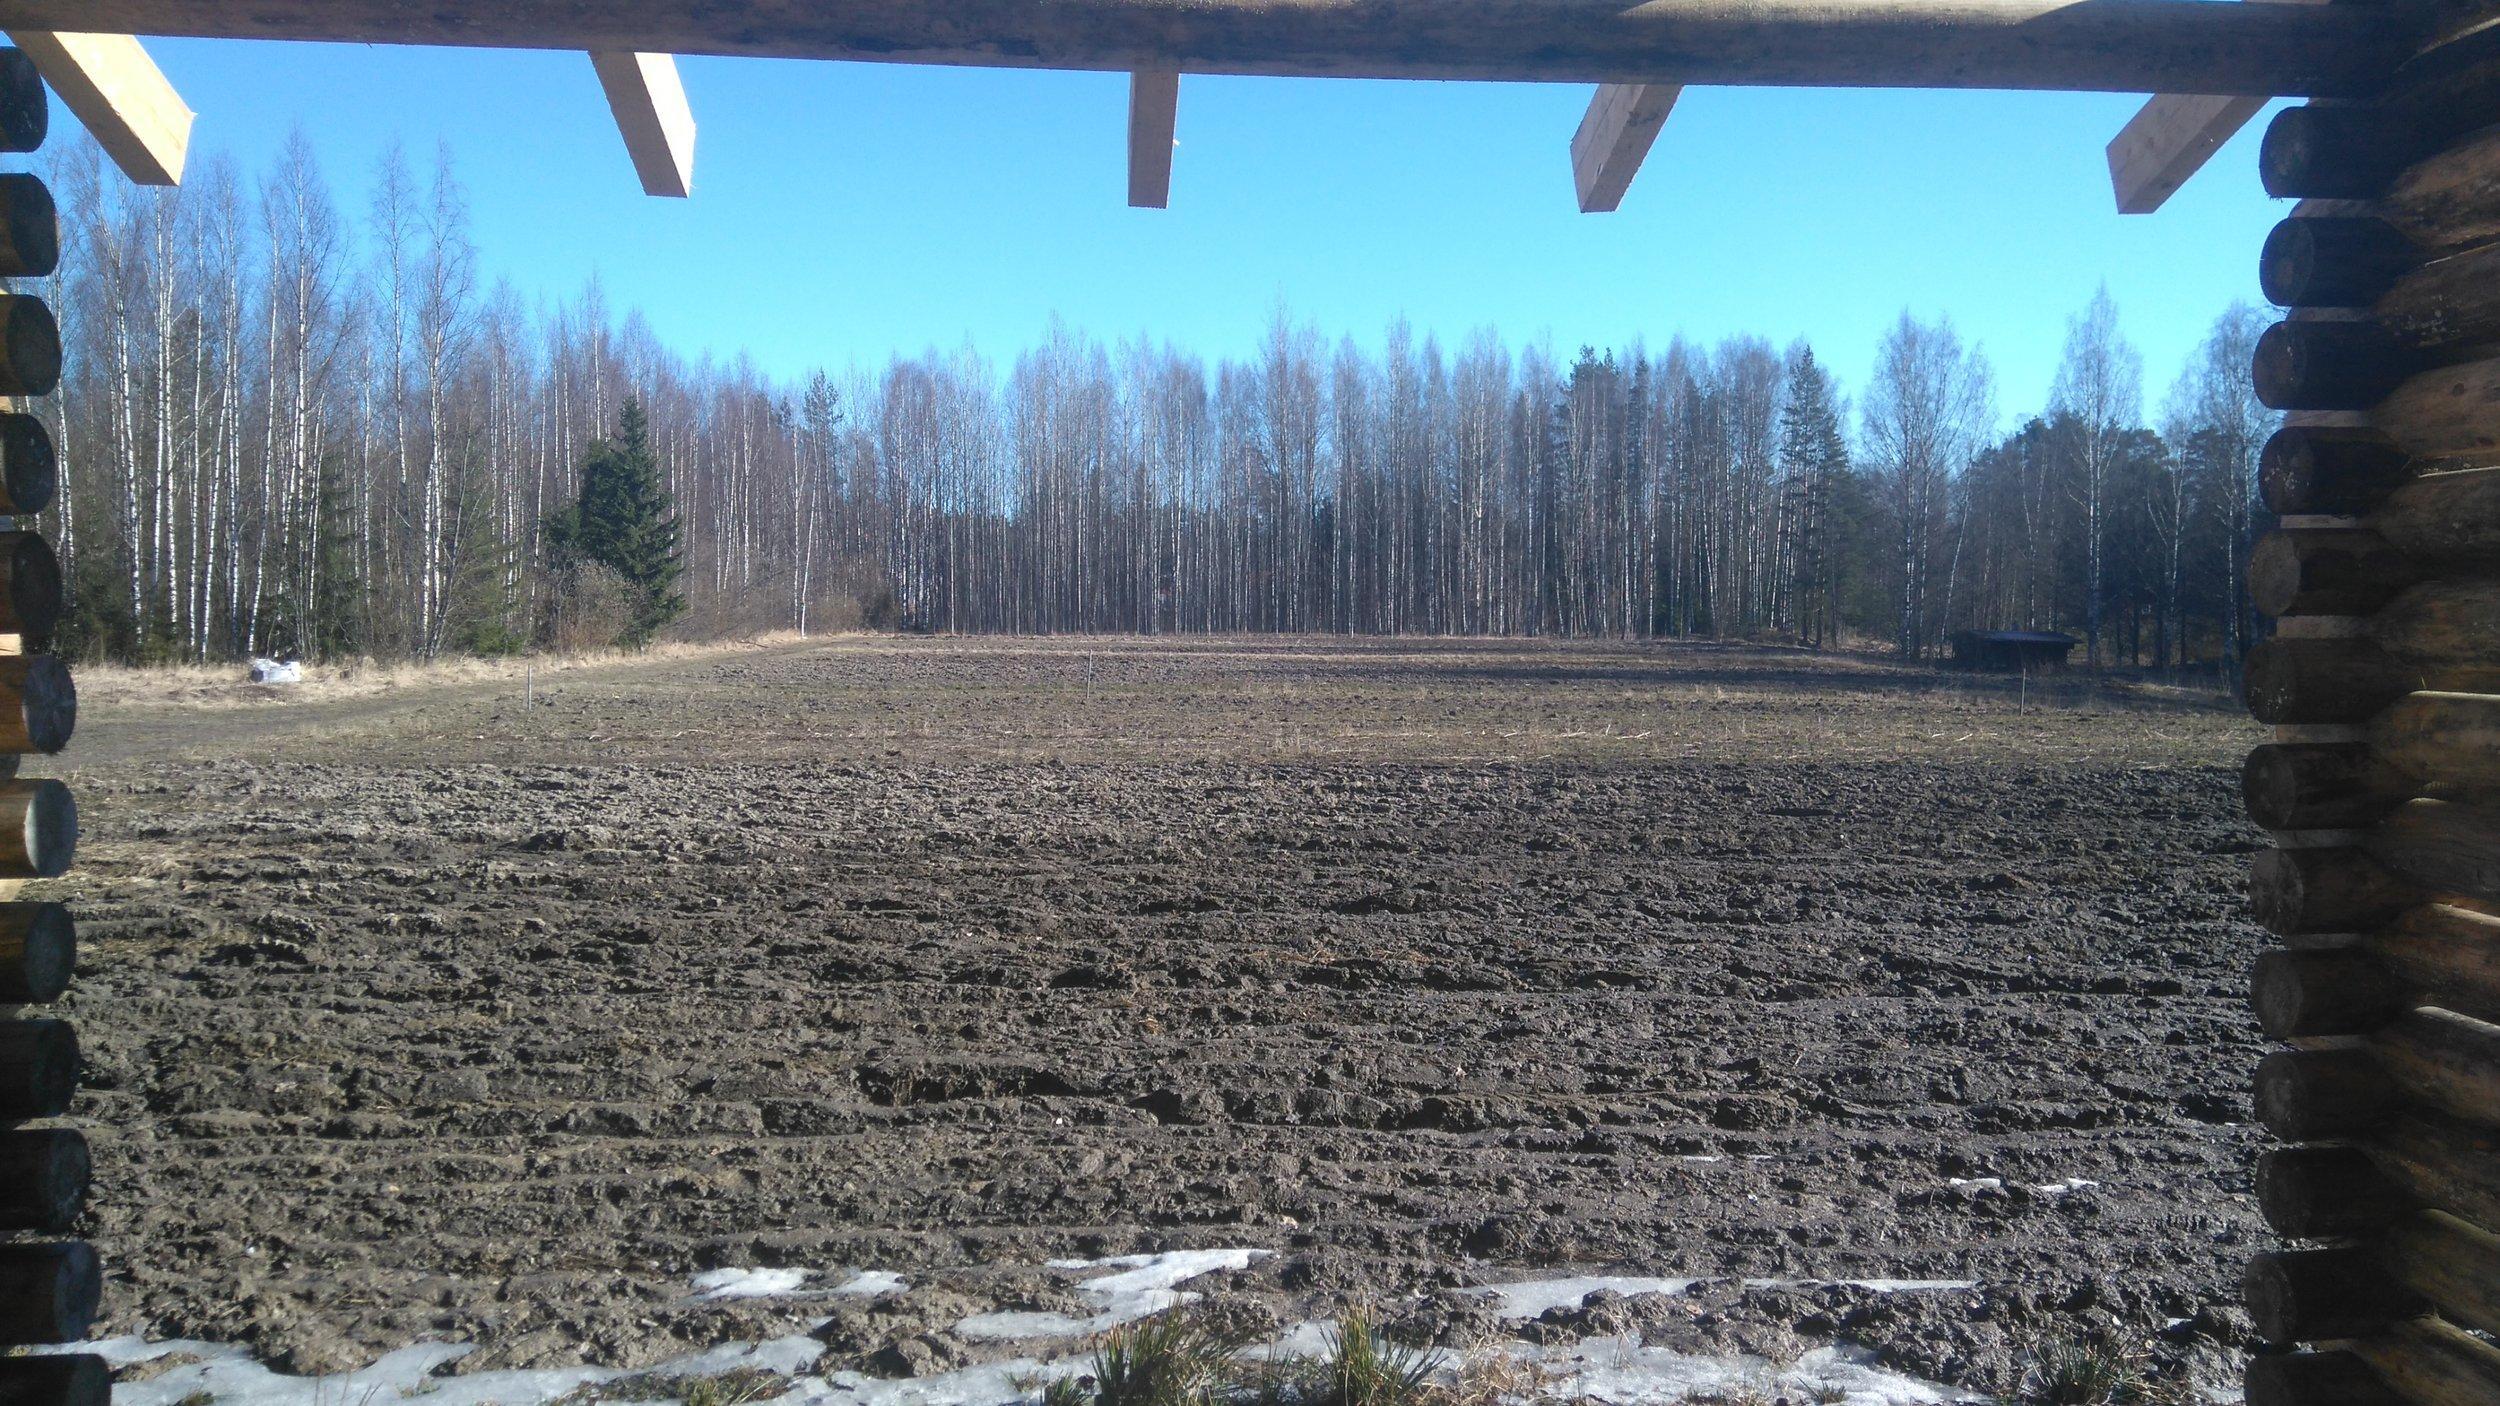 Maisema saapuessani pellolle